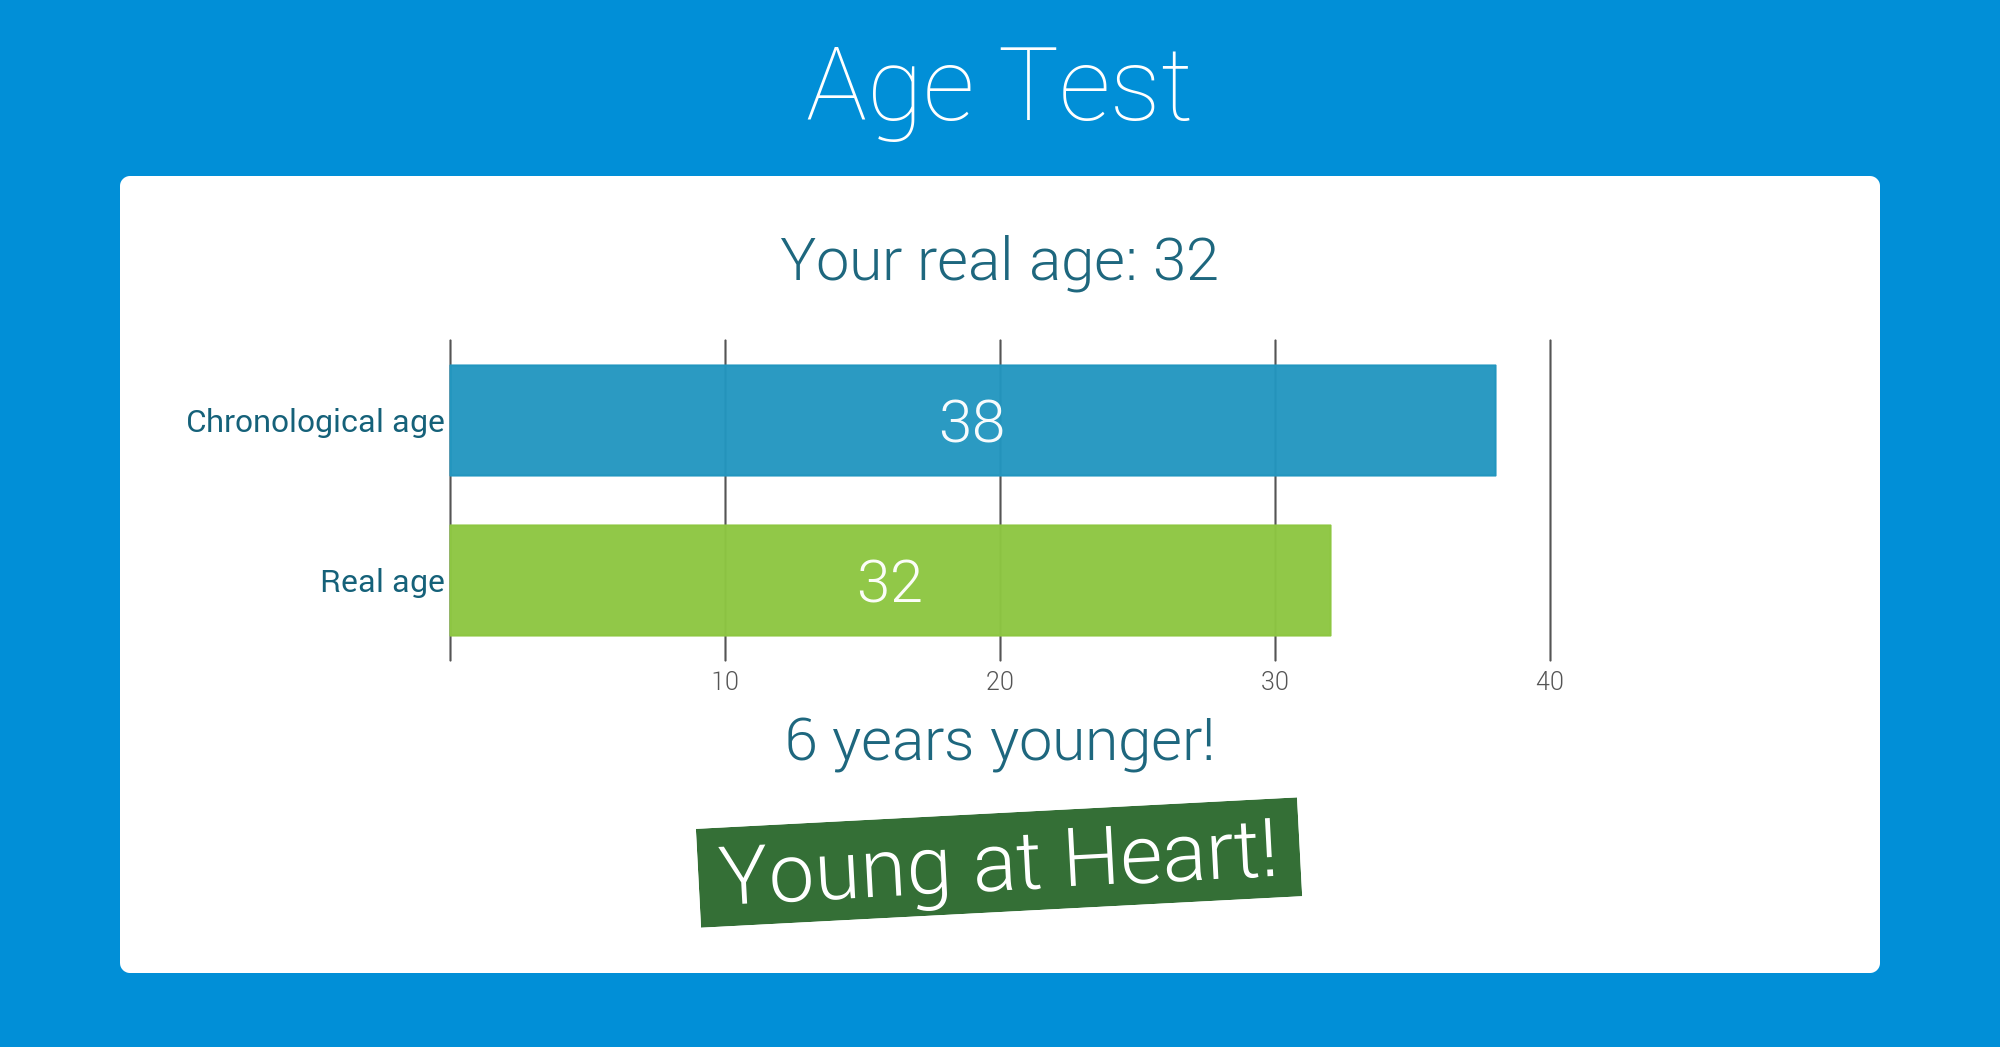 http://www.age-test.com/p/6mc96l.png